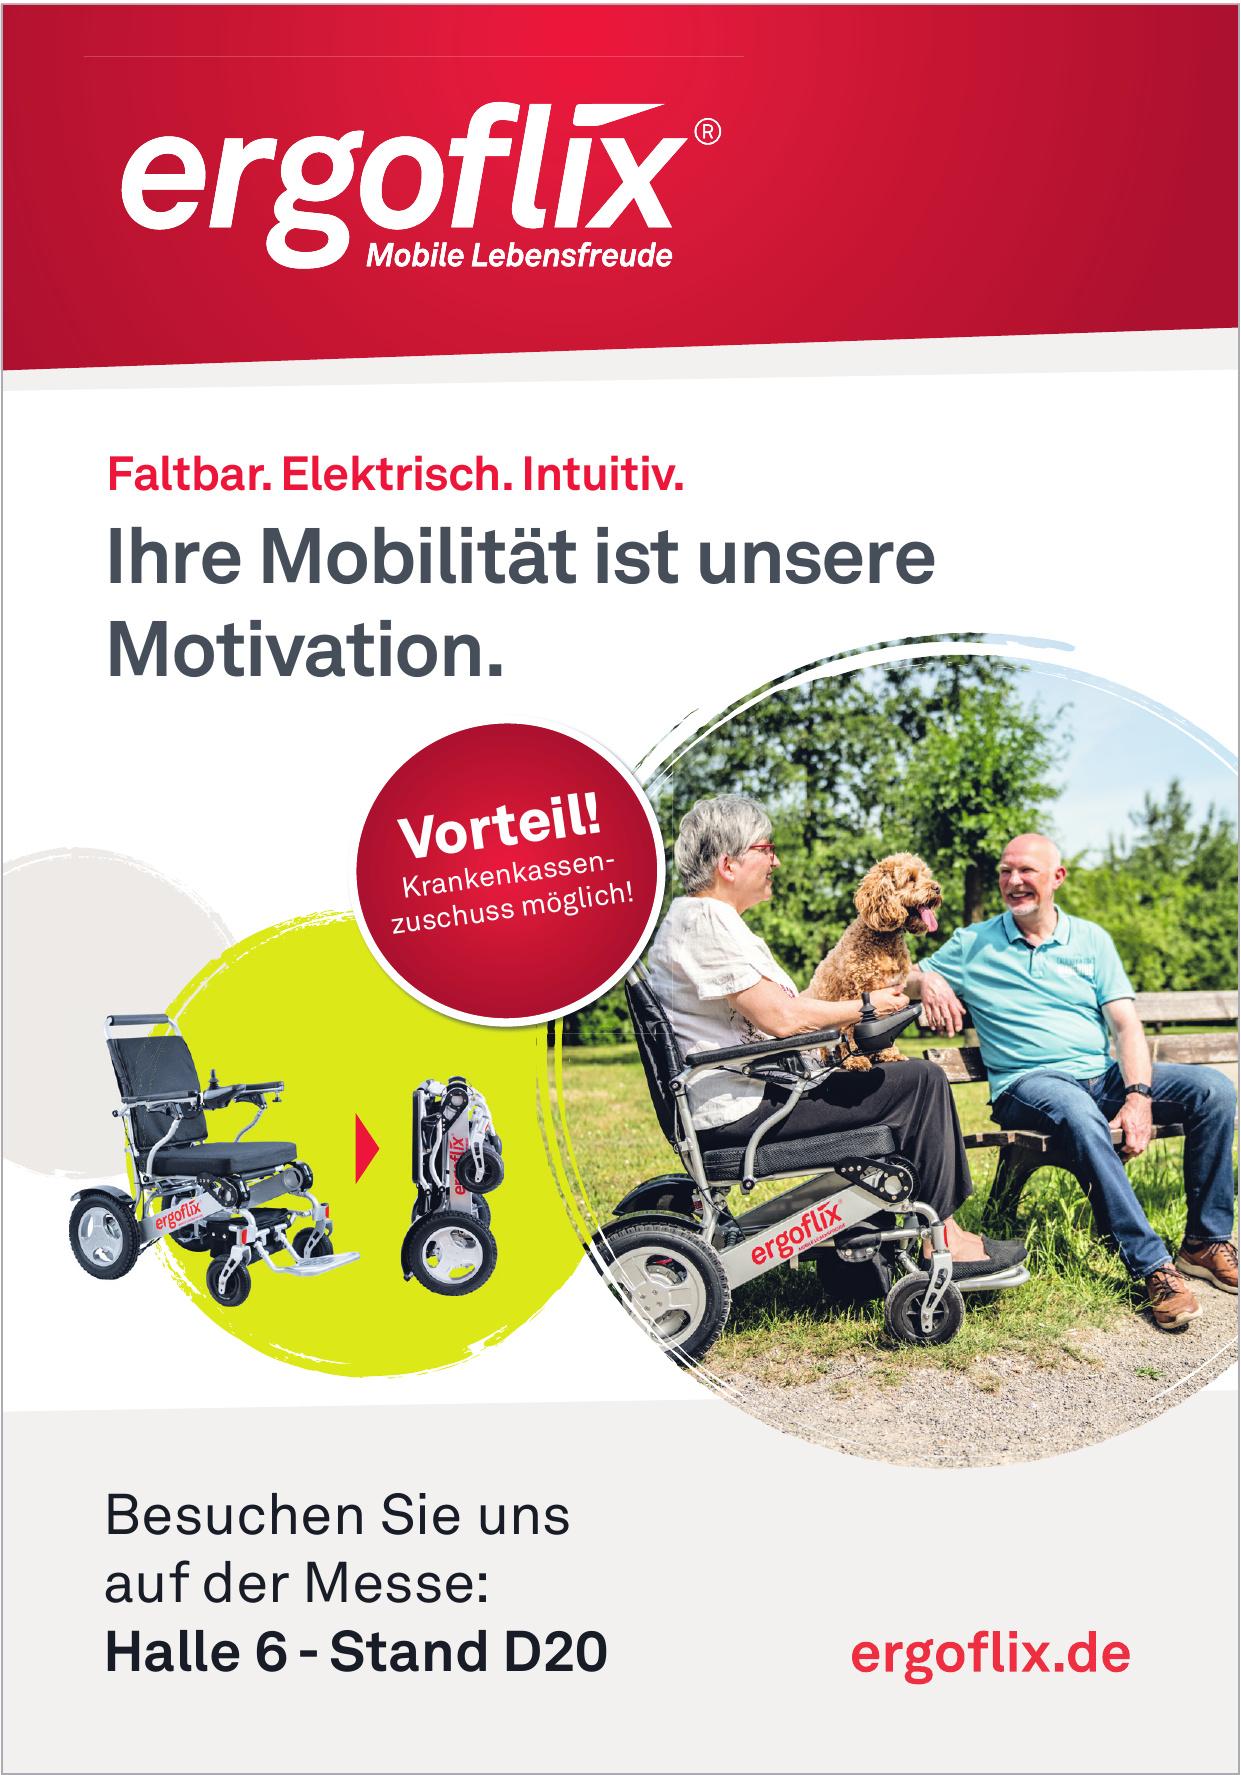 ergoflix - Mobile Lebensfreude